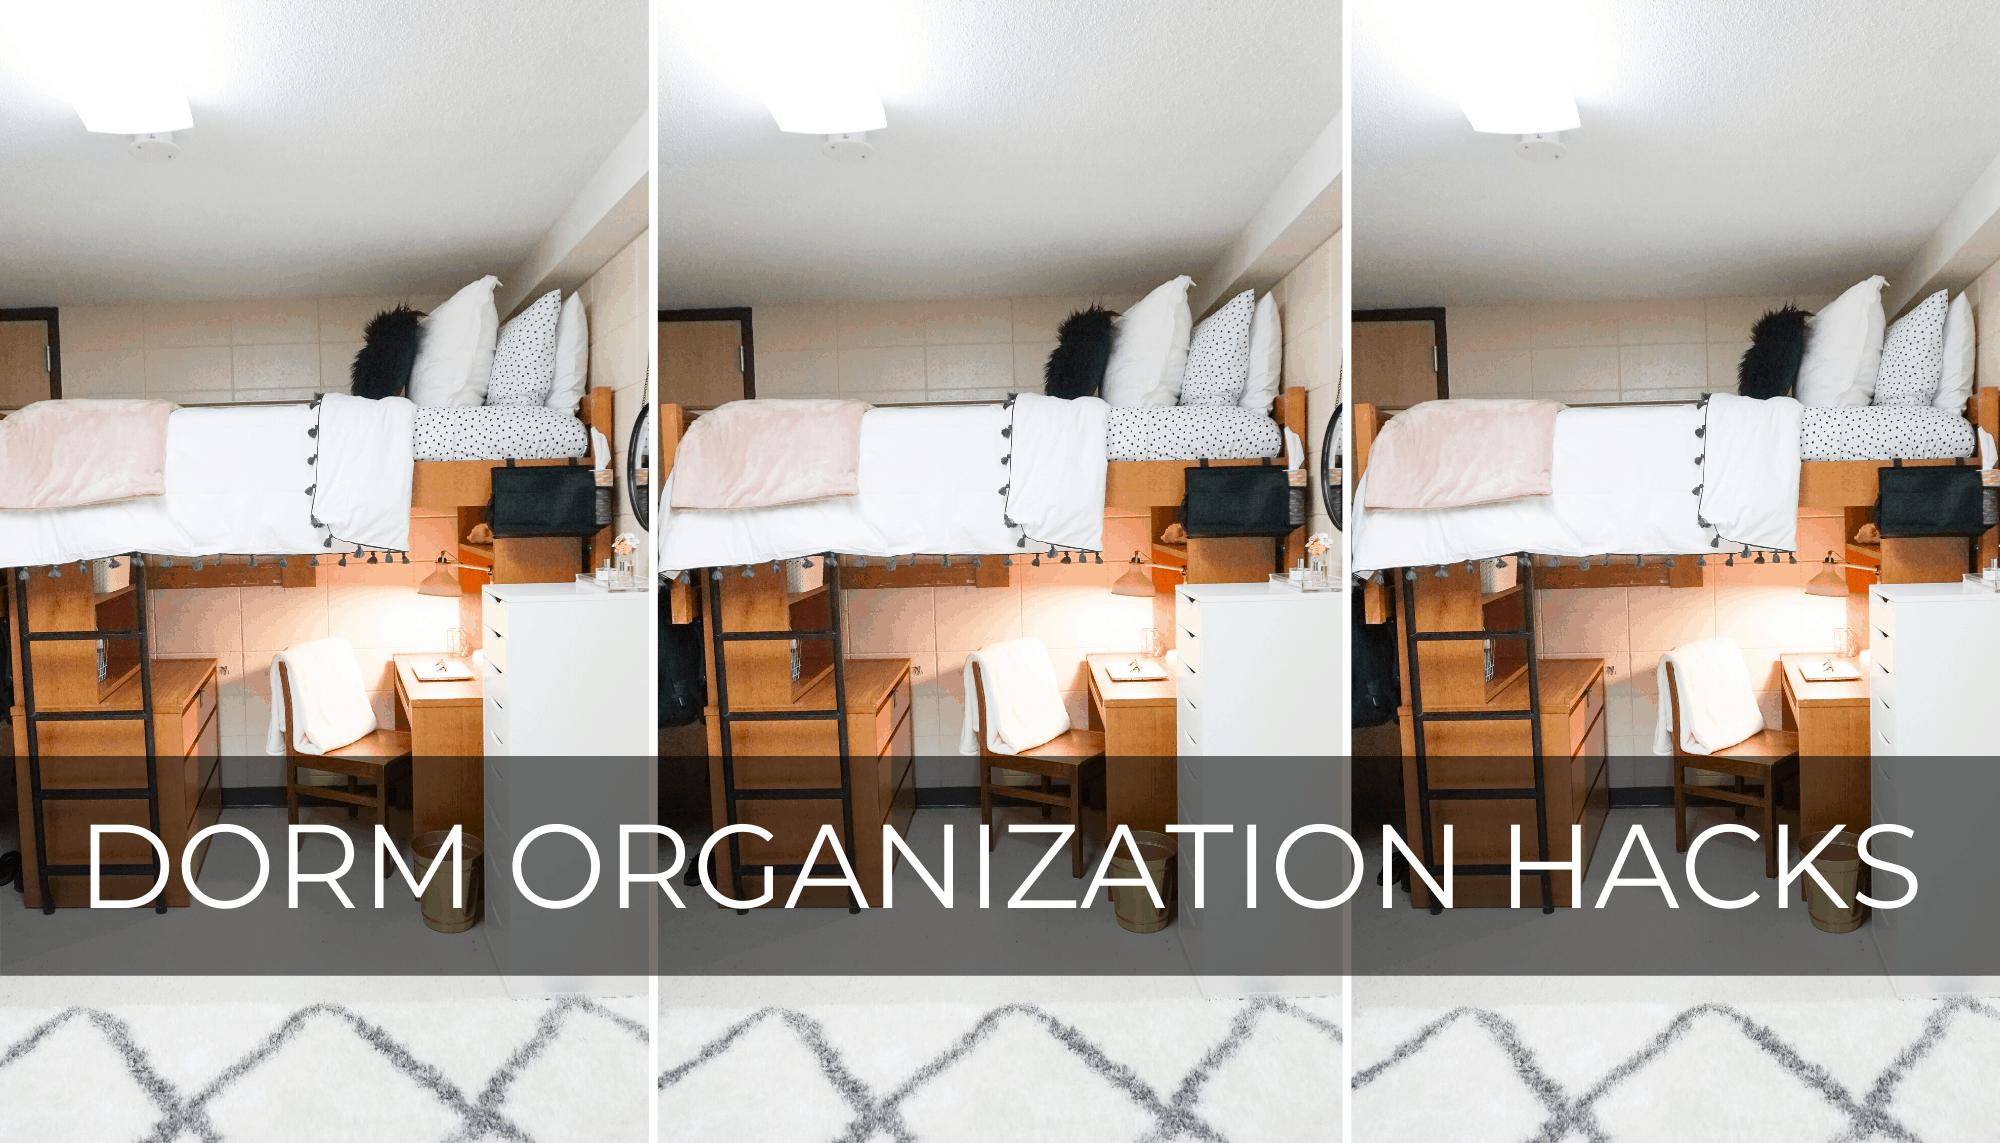 dorm organization hacks